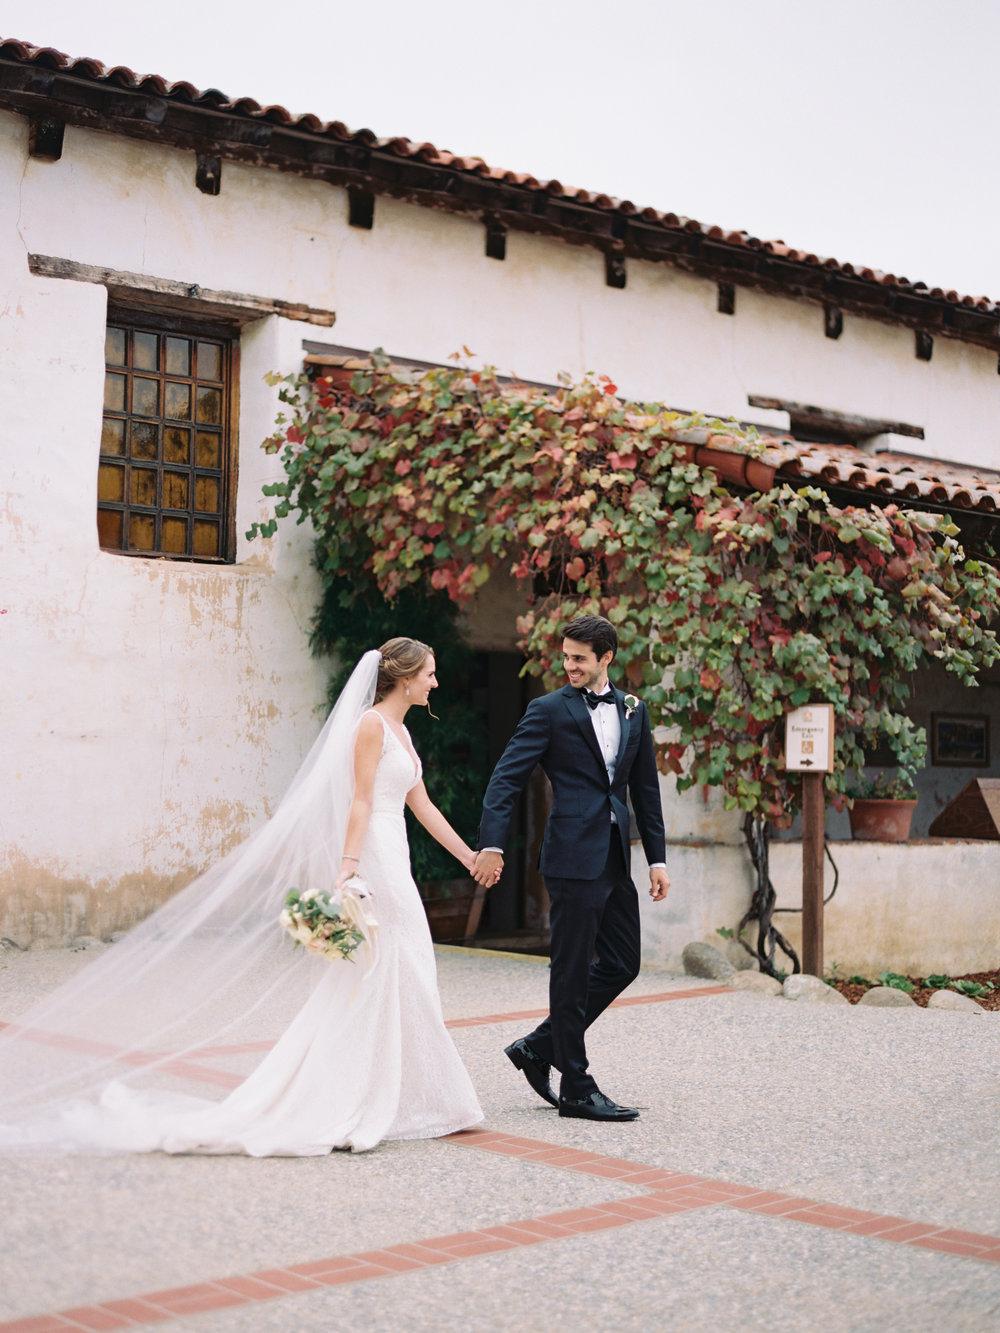 485-fine-art-film-photographer-carmel-california-destination-wedding-brumley-wells-tim-courtney.jpg